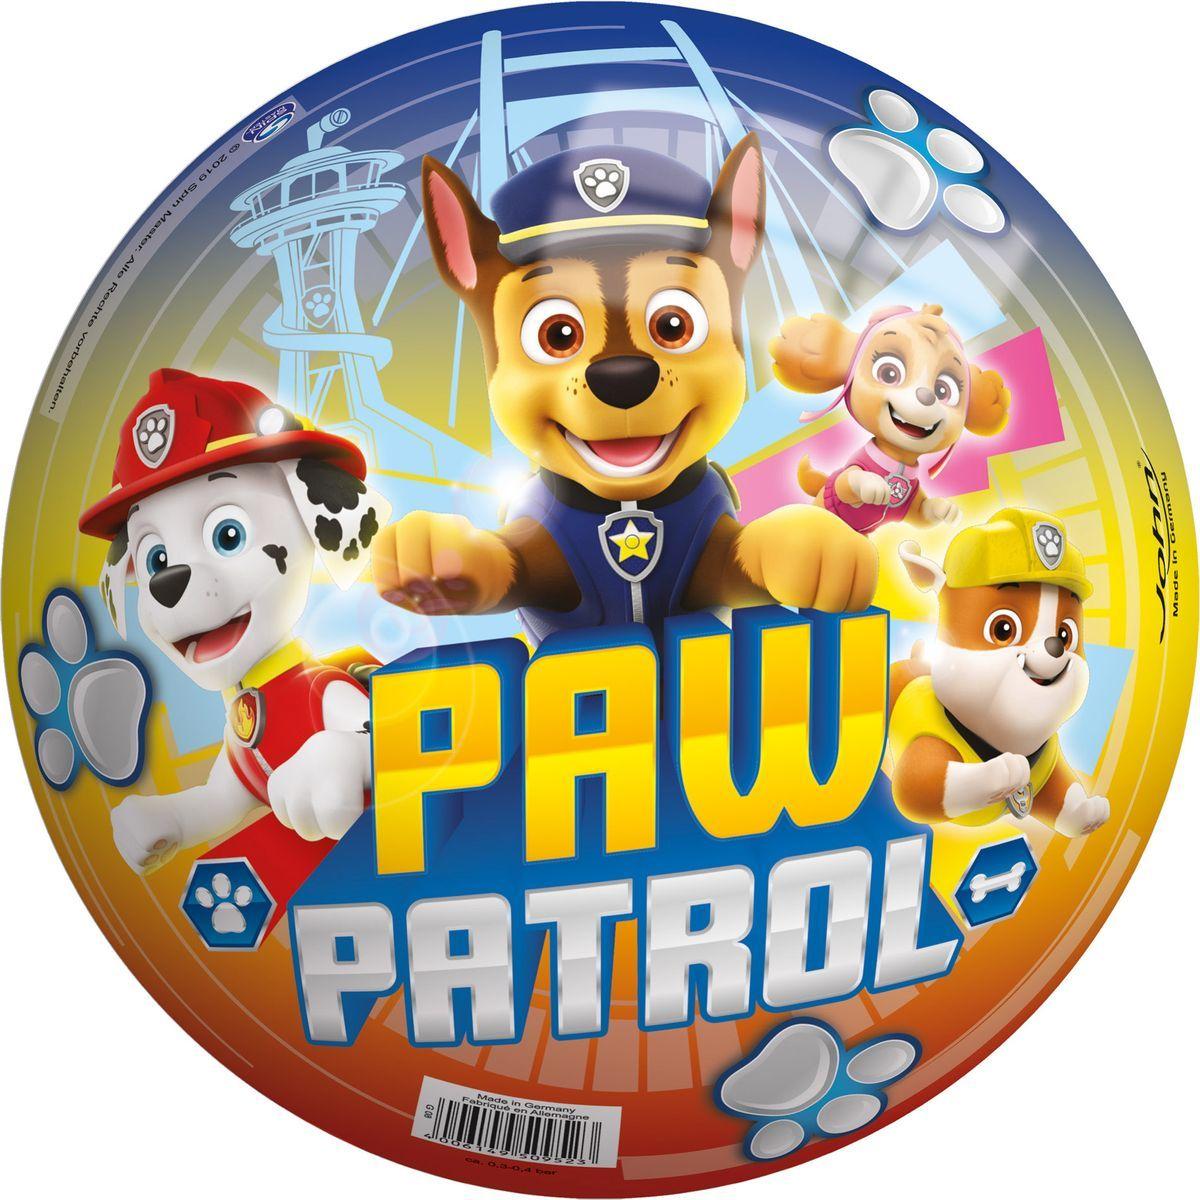 John Lopta Paw Patrol 23cm farebný s nápisom Paw Patrol